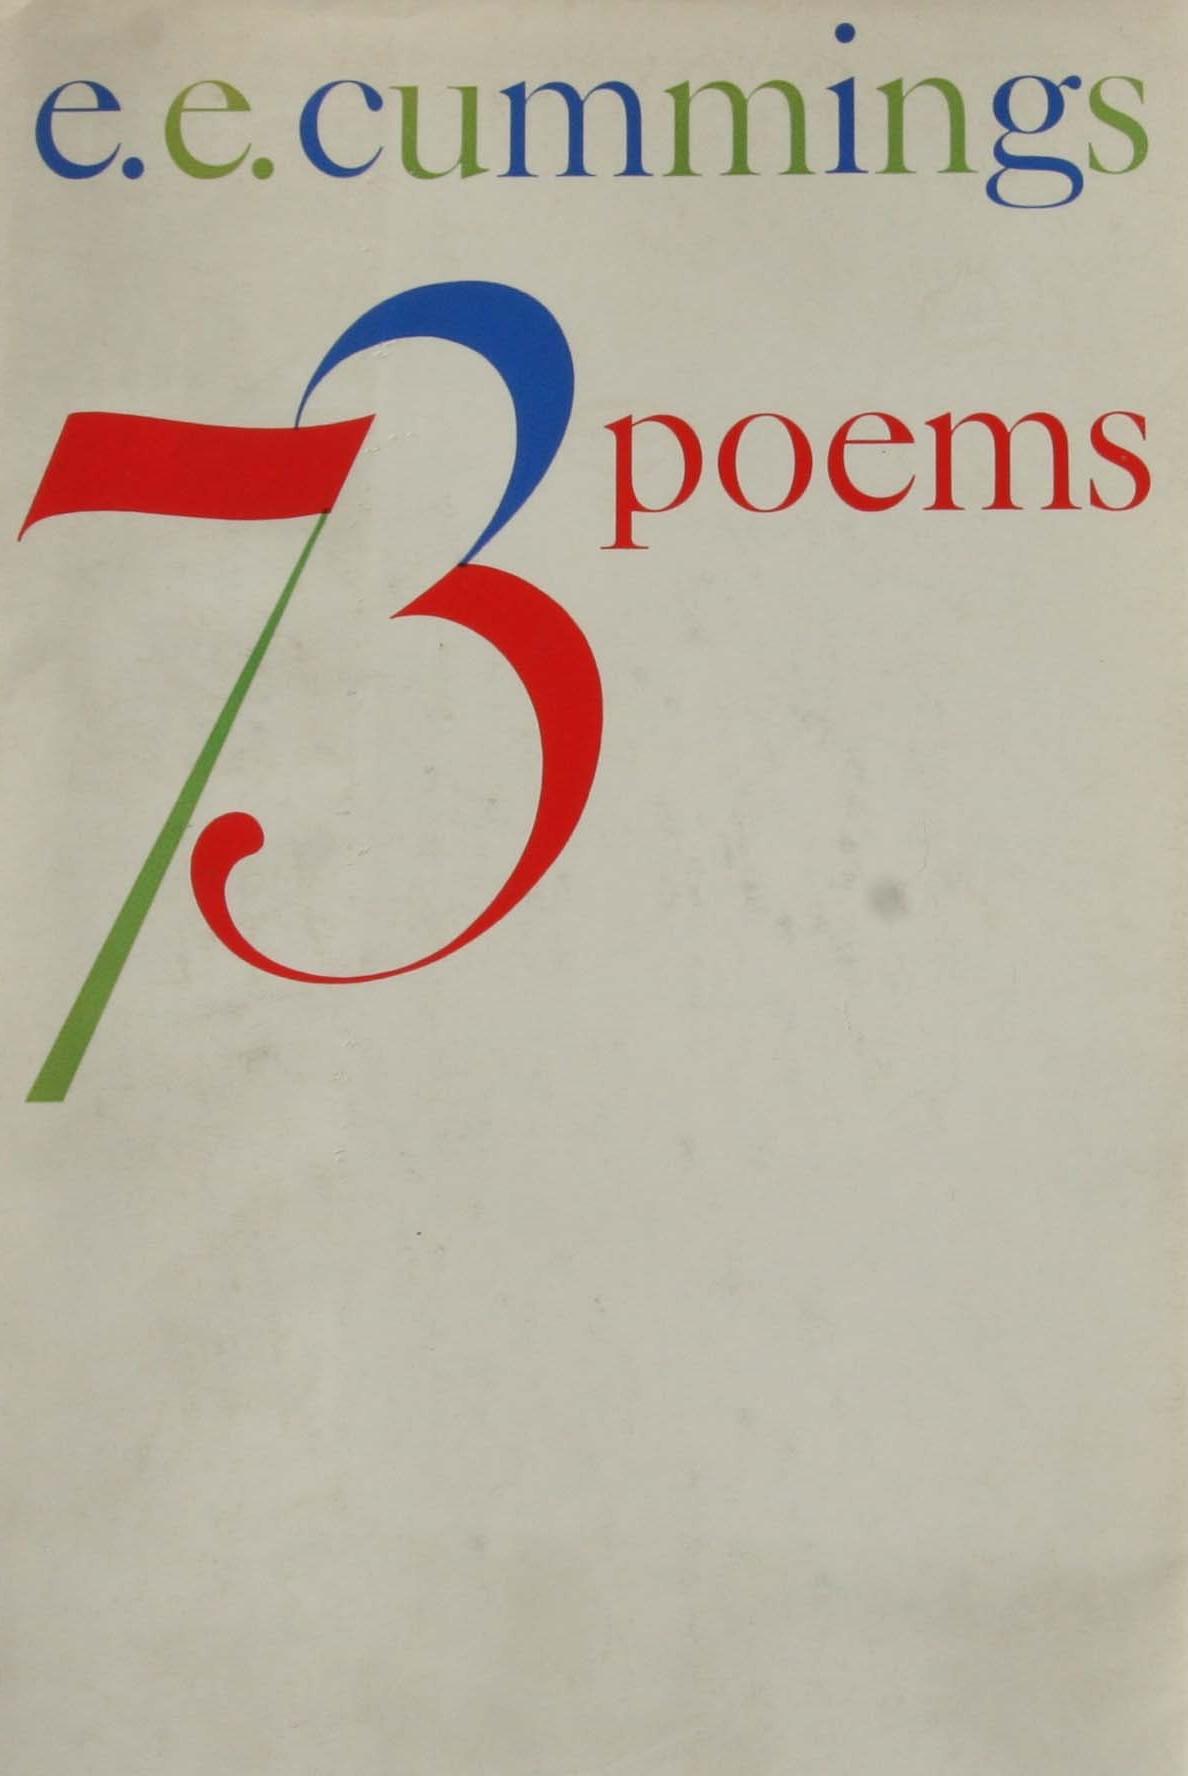 e e cummings 73 poems first edition